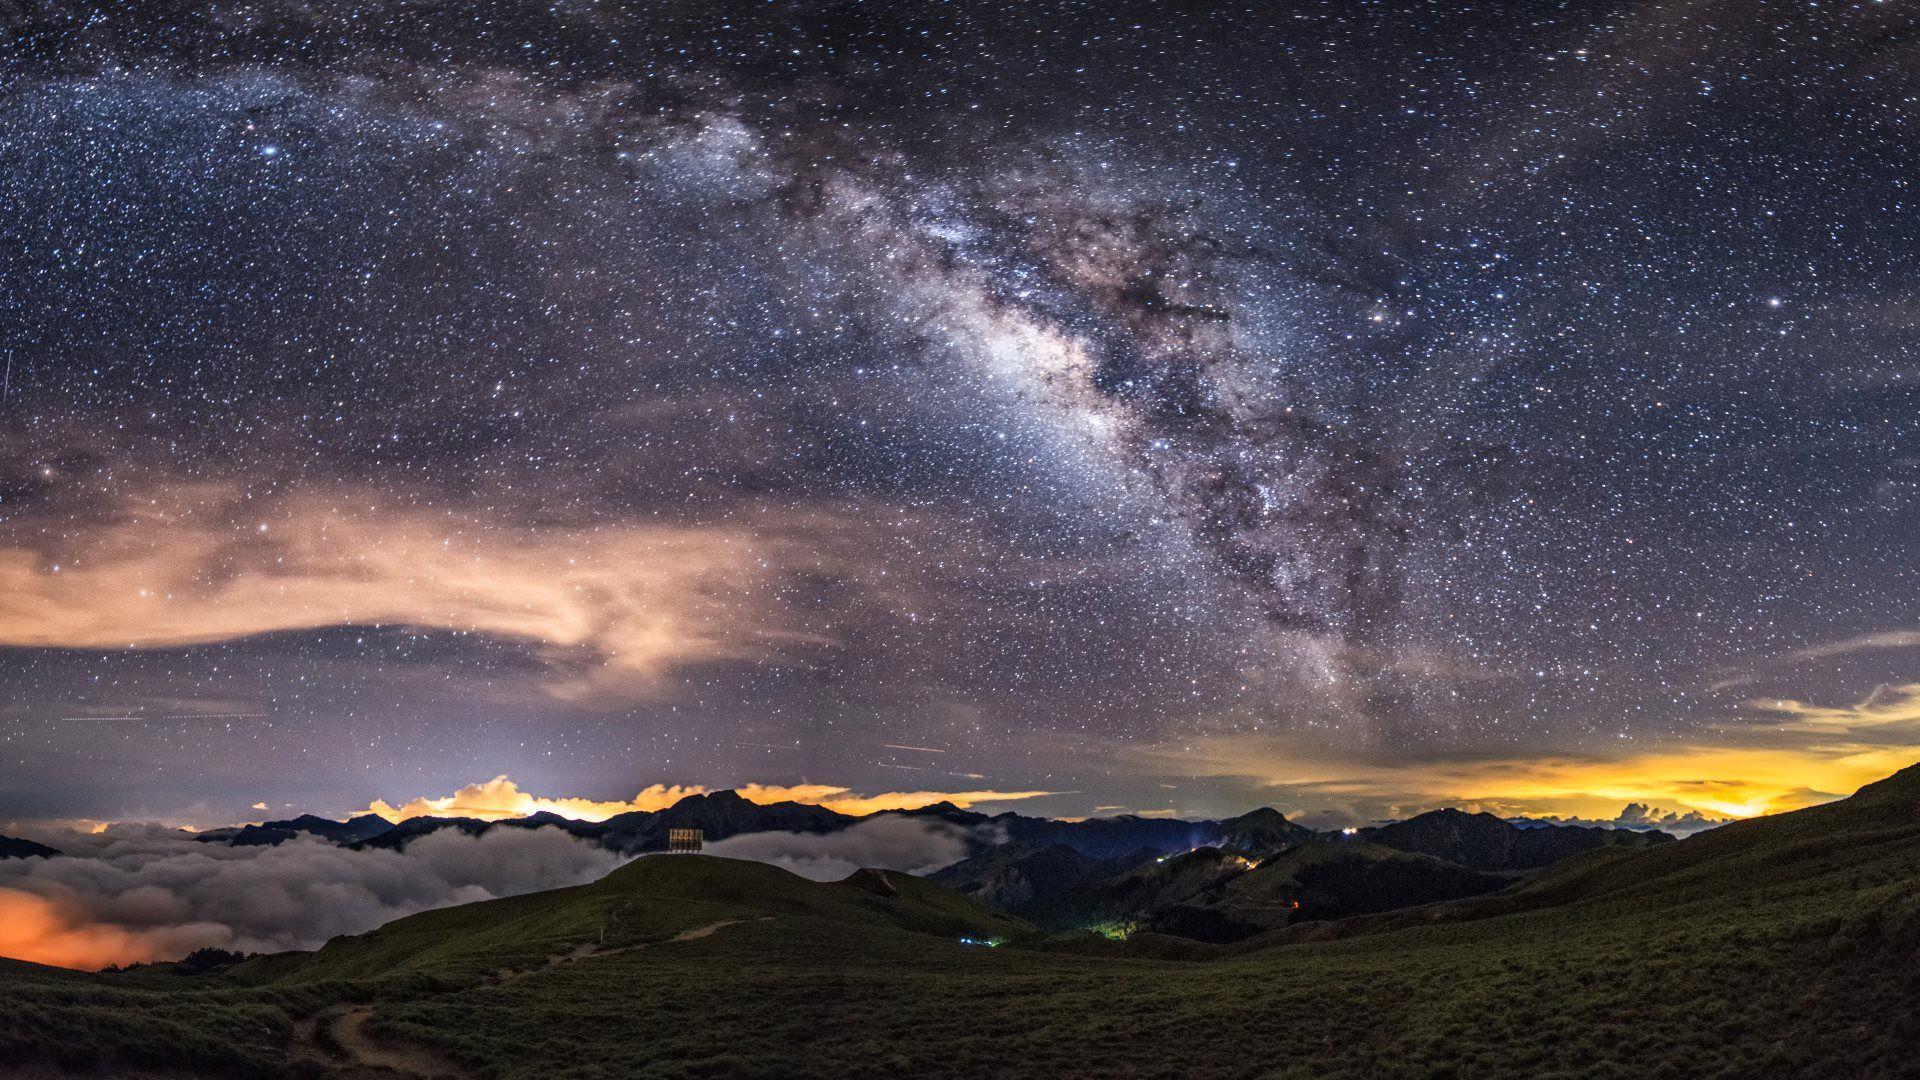 Milky Way On The Night Sky Hd 1920x1080 Milky Way Galaxy Wallpaper Night Sky Wallpaper Space Wallpaper 4k